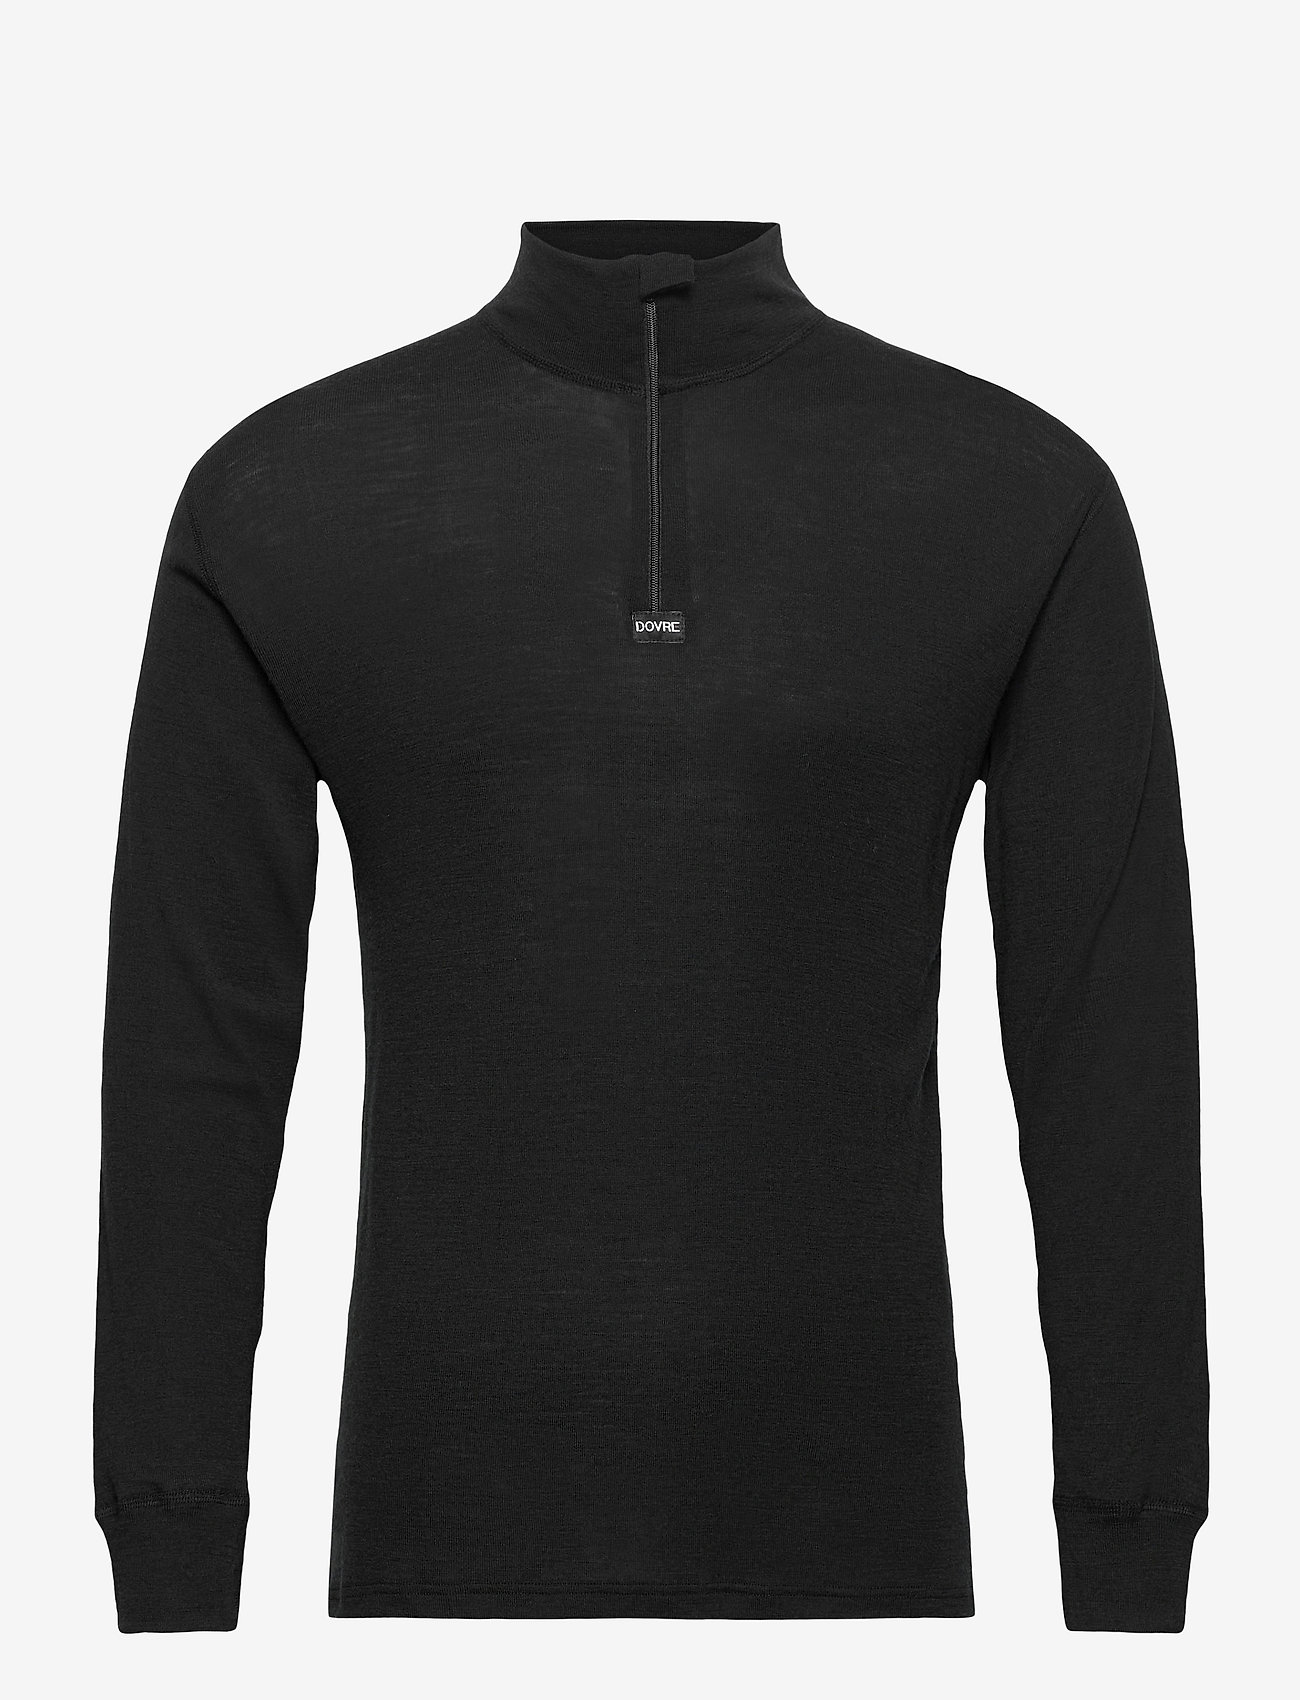 Dovre - Dovre Wool 1/1 ærme & Zipper - half zip - black - 0